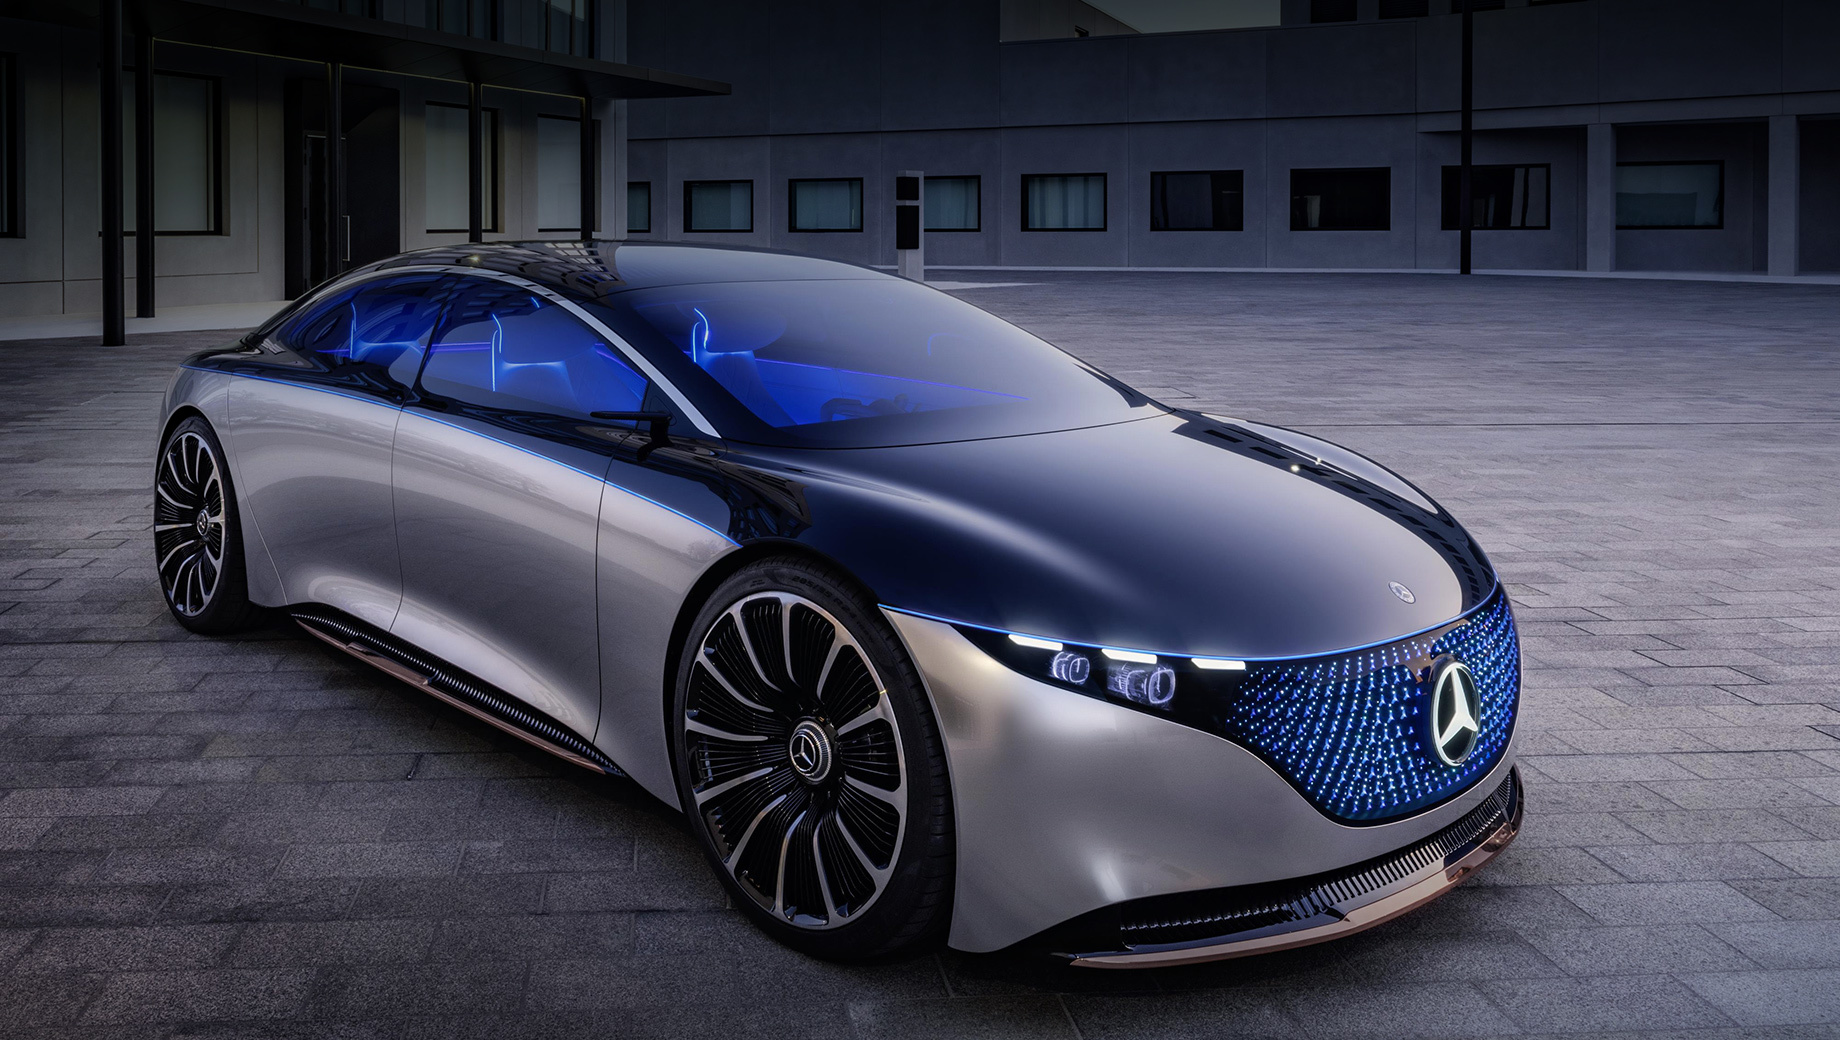 Mercedes-Benz и Nvidia пообещали революционный автопилот